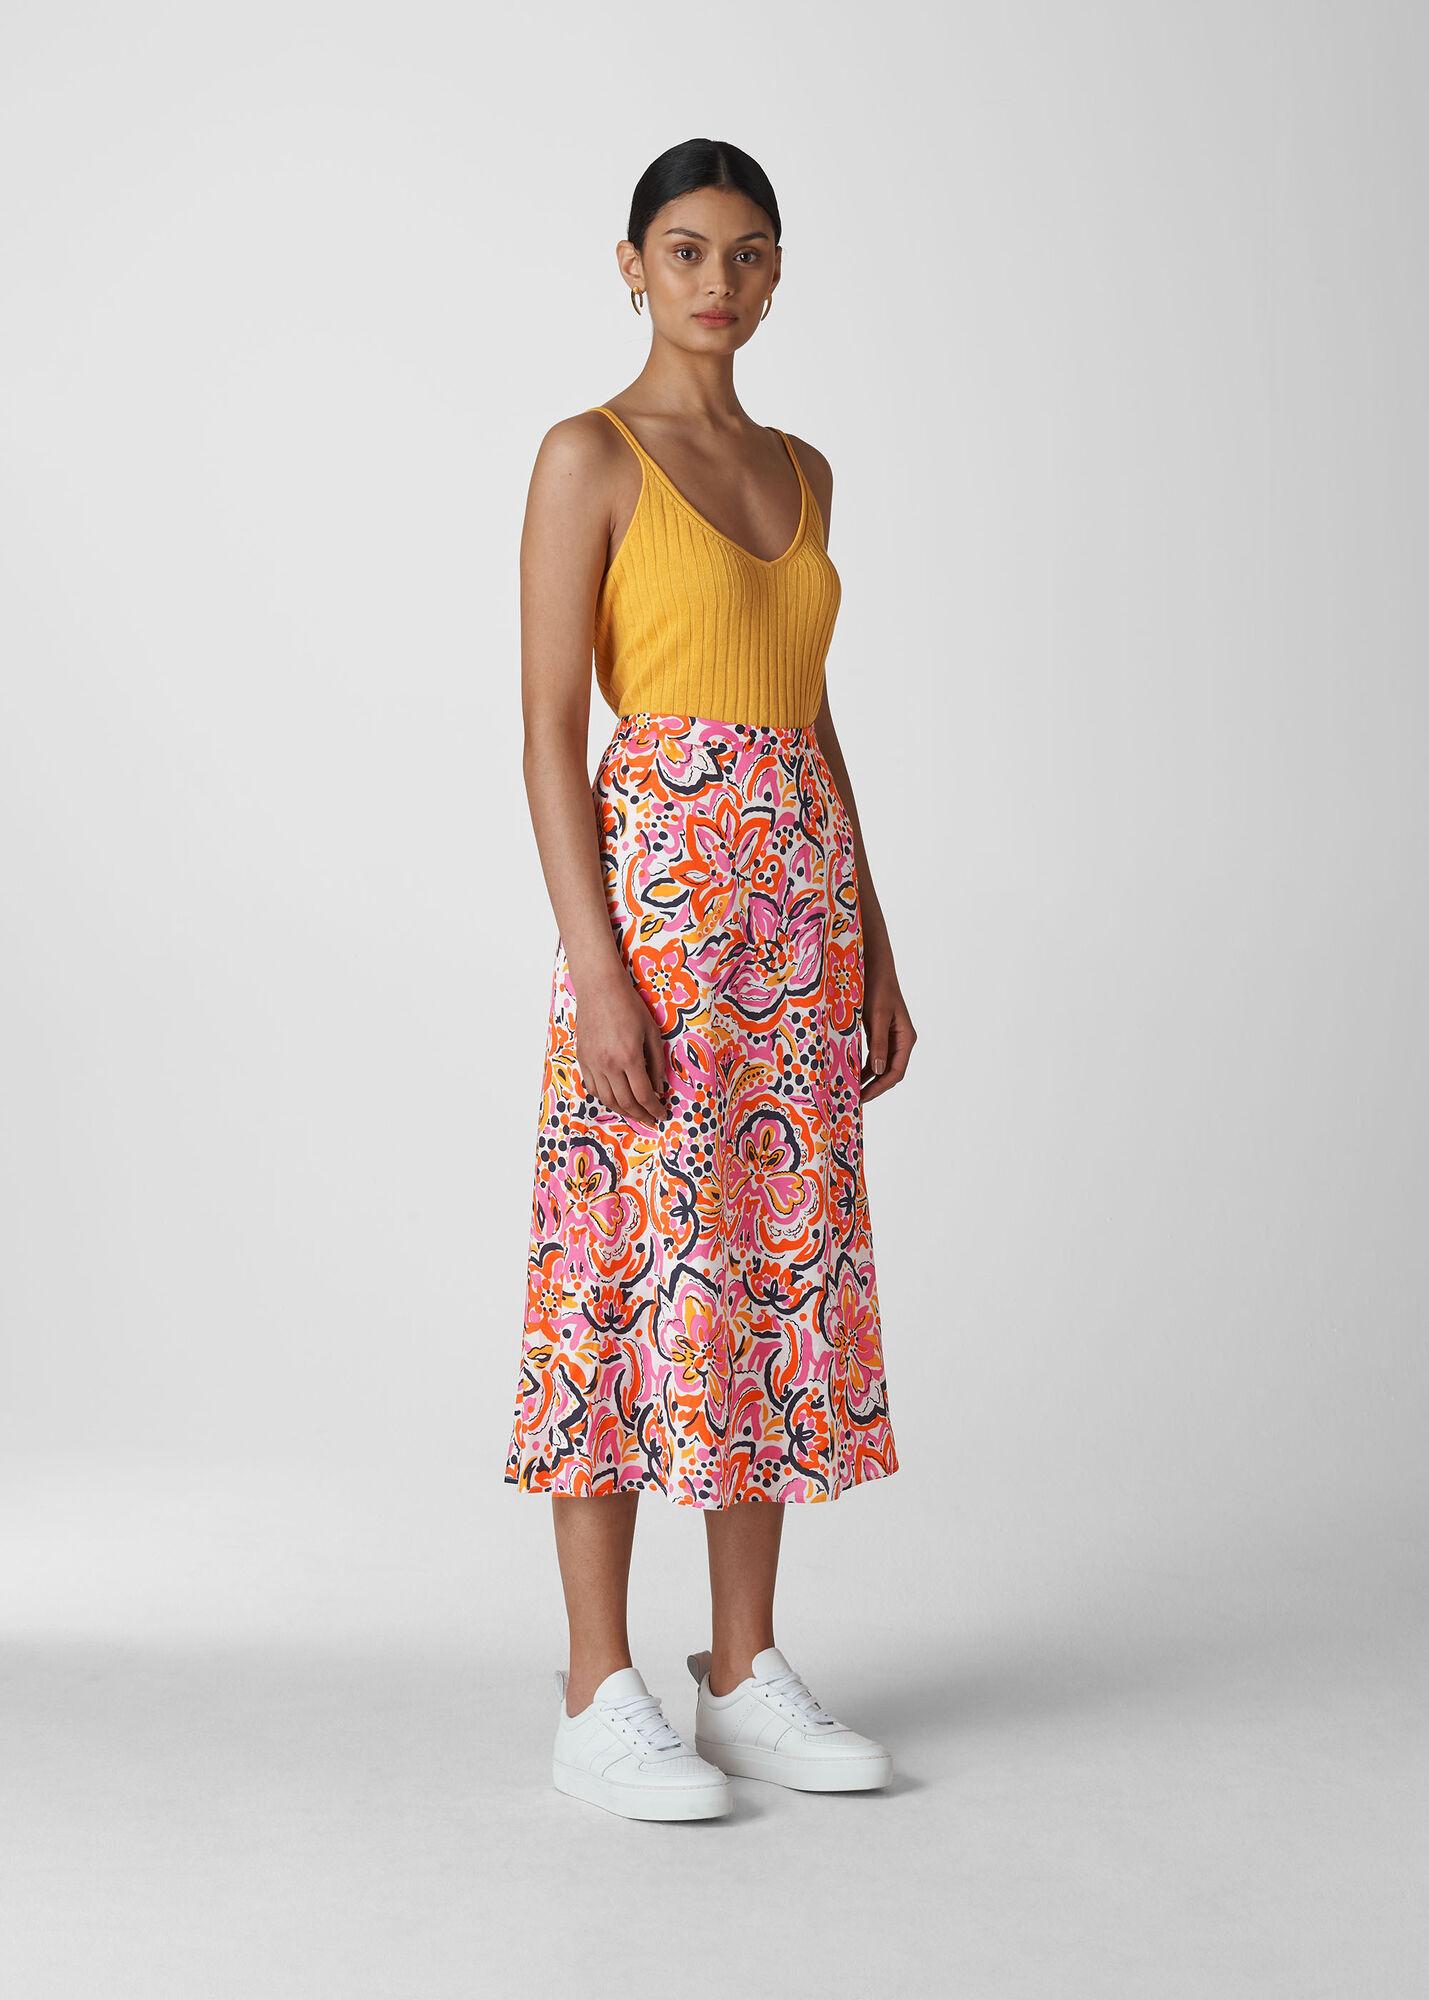 Art Floral Print Skirt